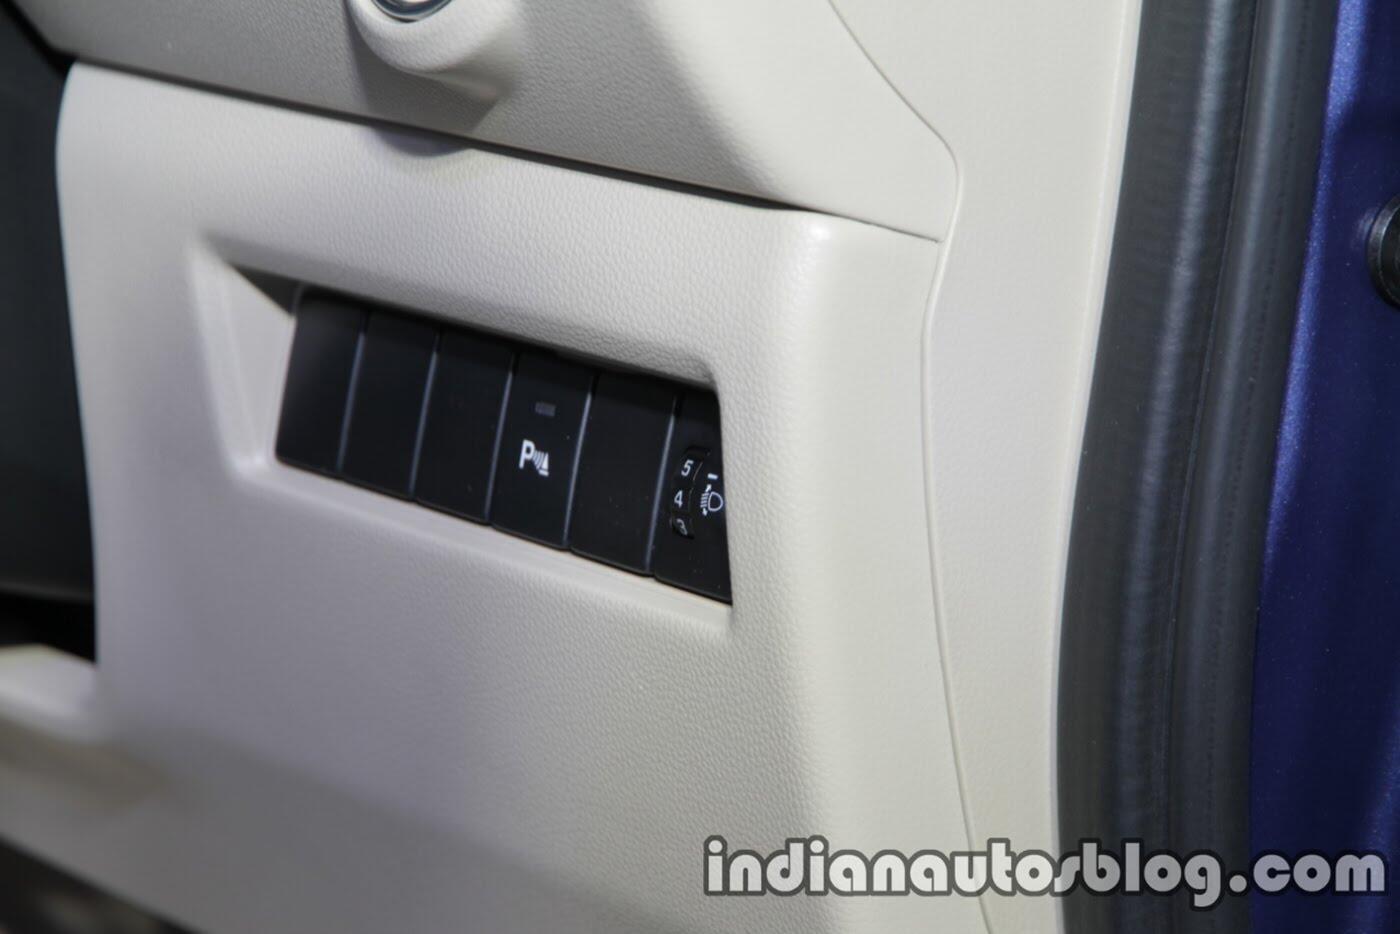 Xem thêm ảnh phiên bản sedan của Suzuki Swift 2018 - Hình 11